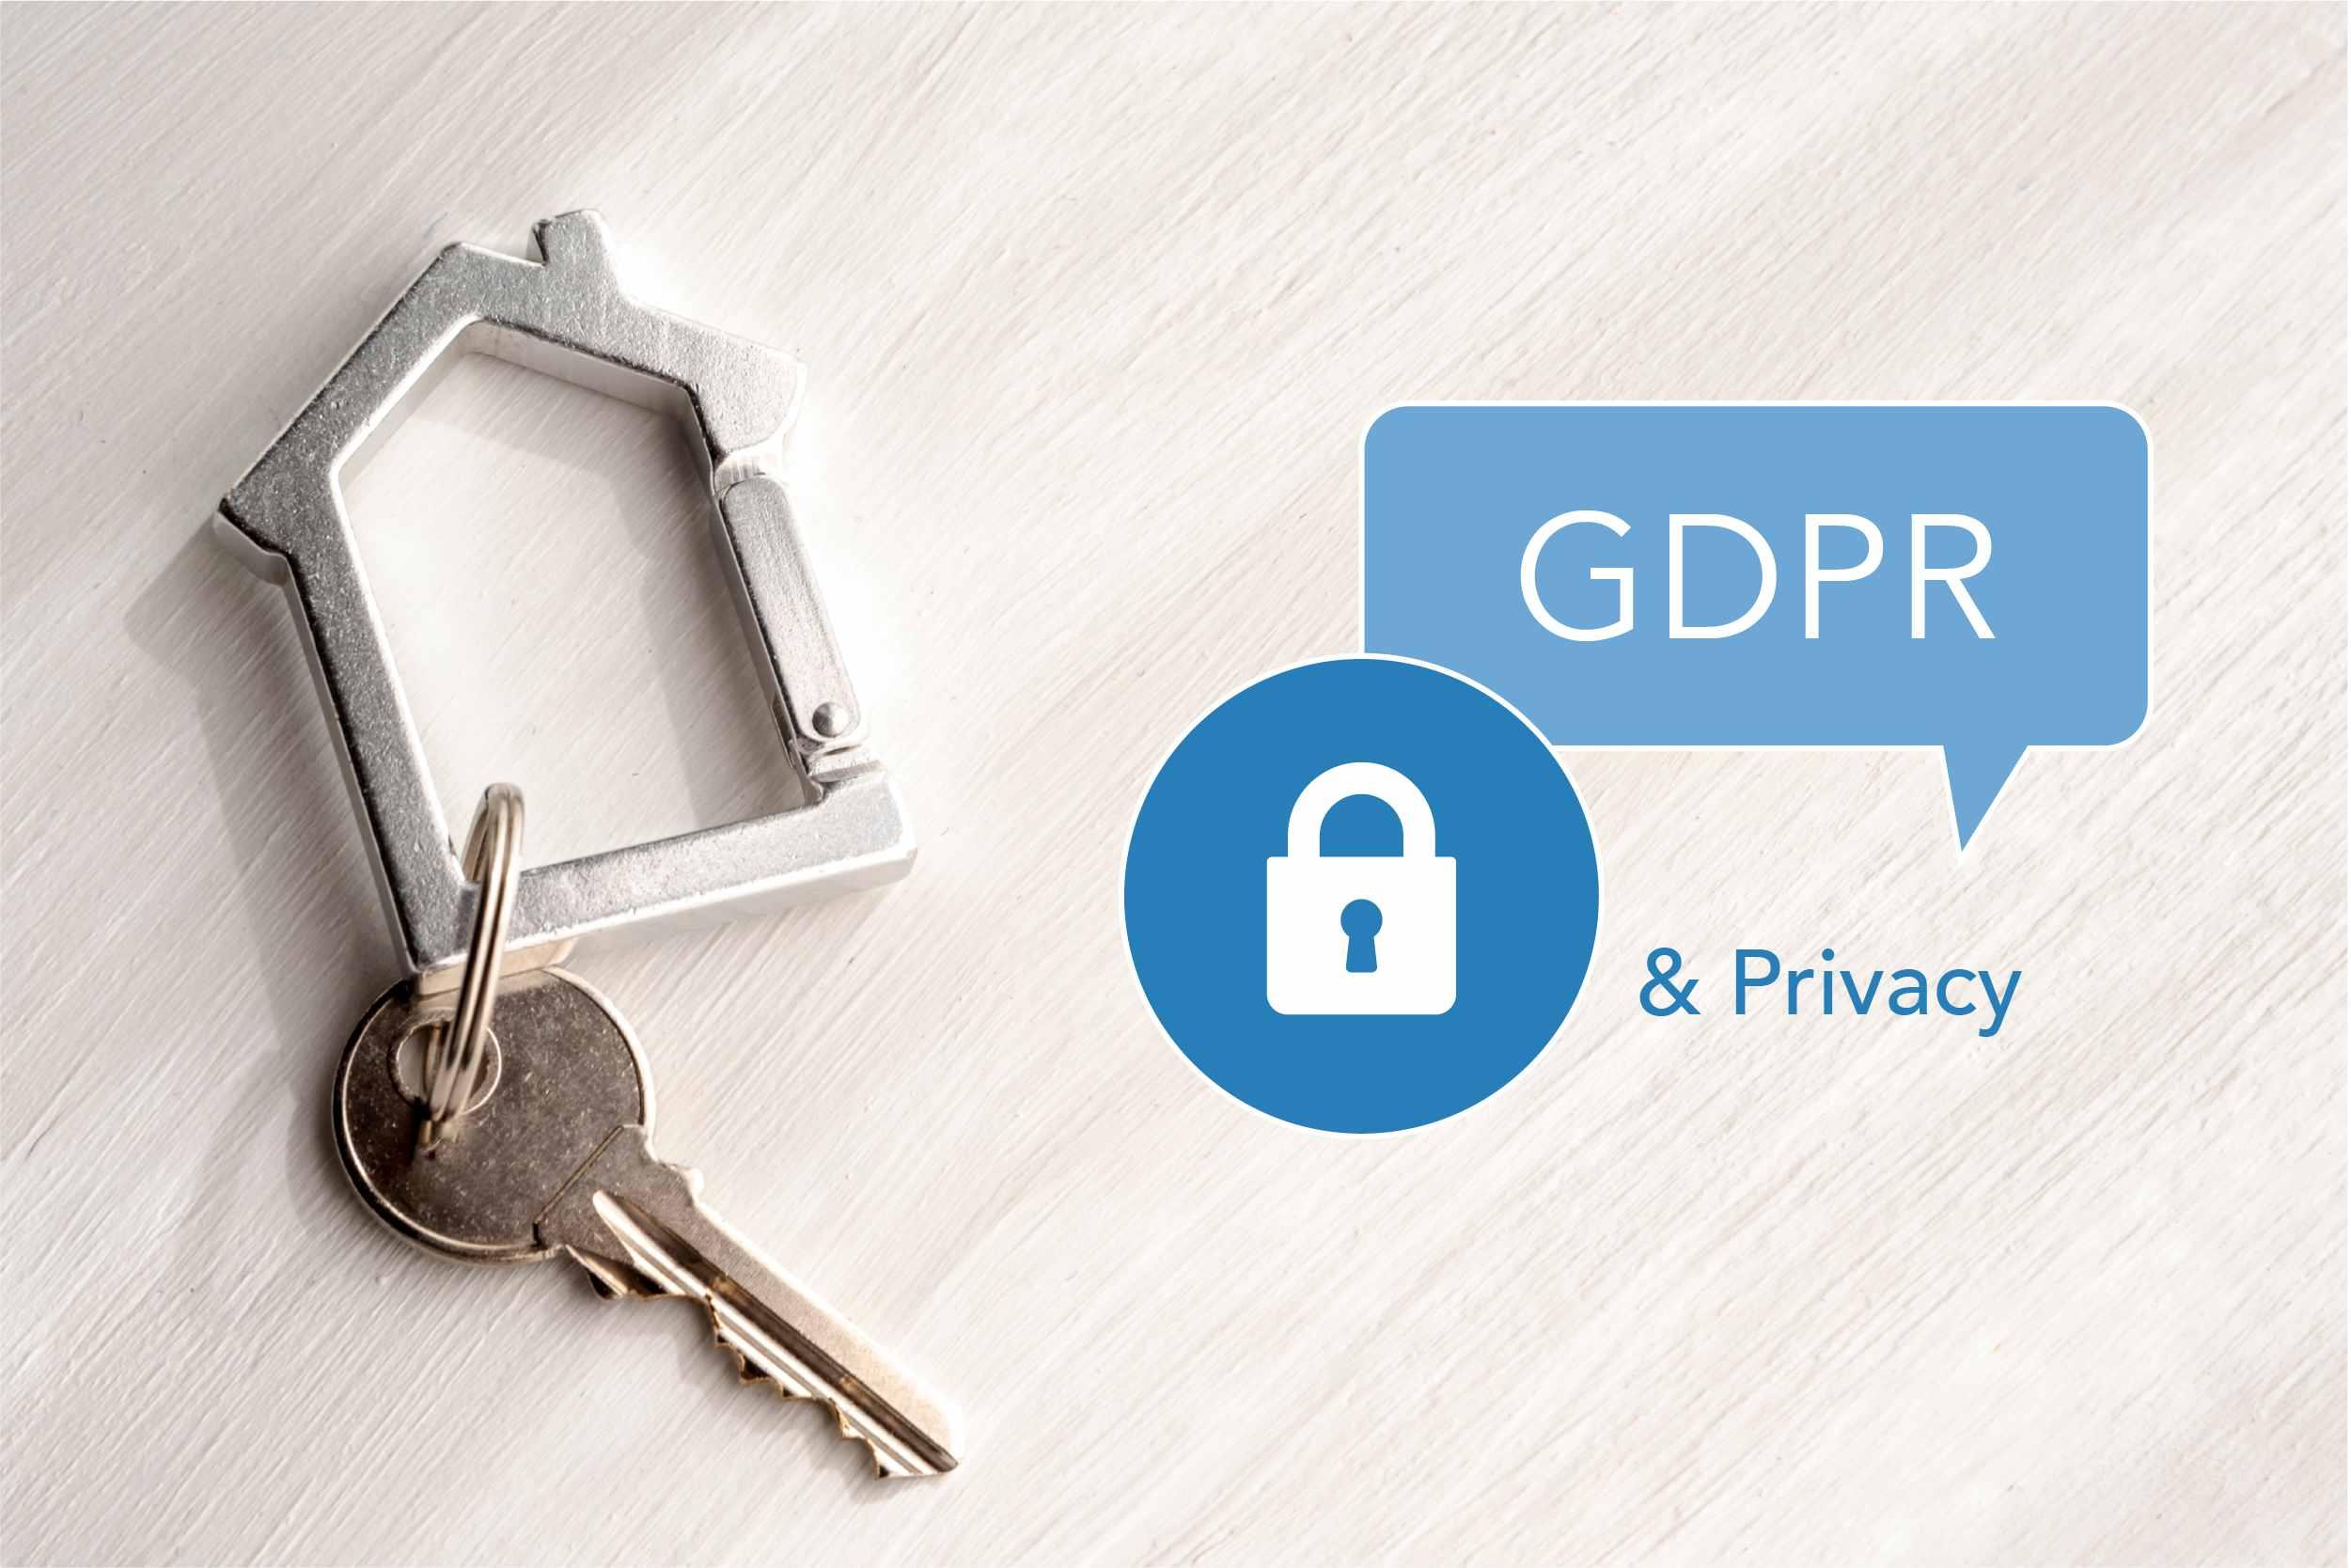 gdpr-privacy